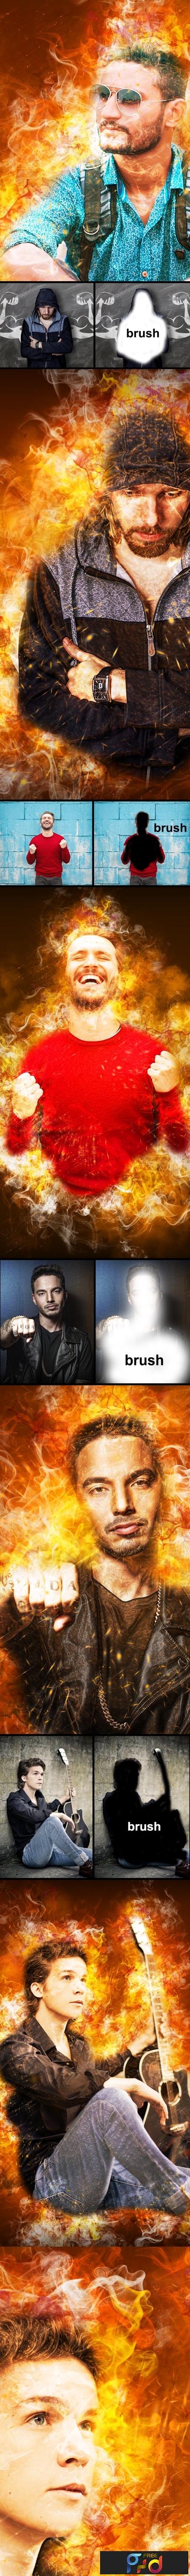 Amazing Flame Photoshop Action 23487754 1